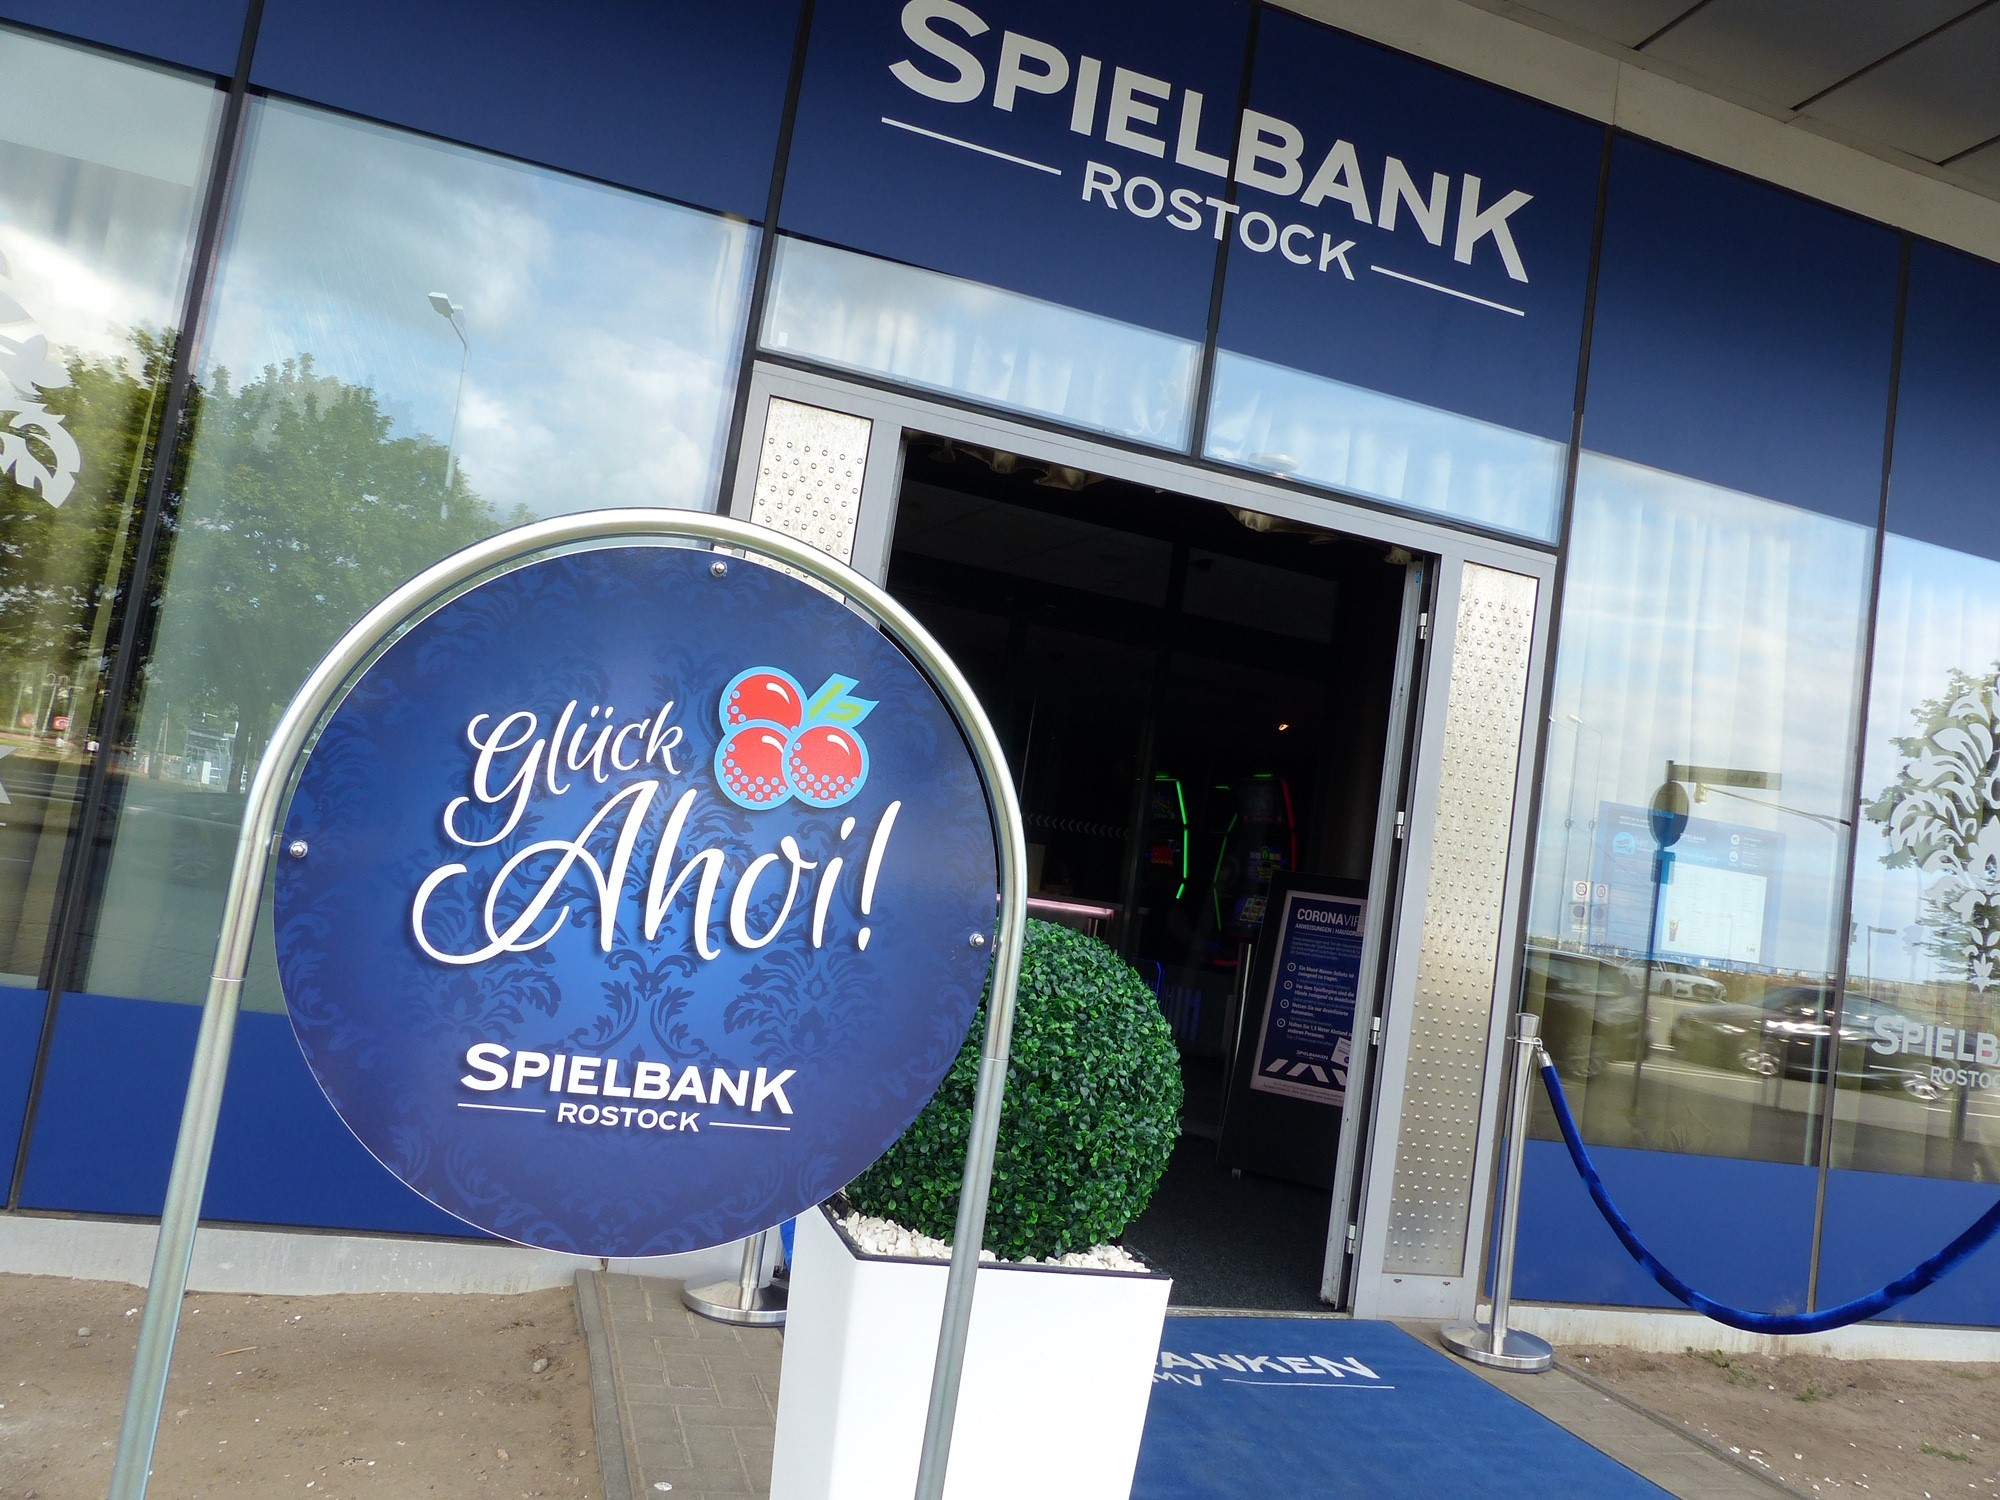 Spielbank Rostock